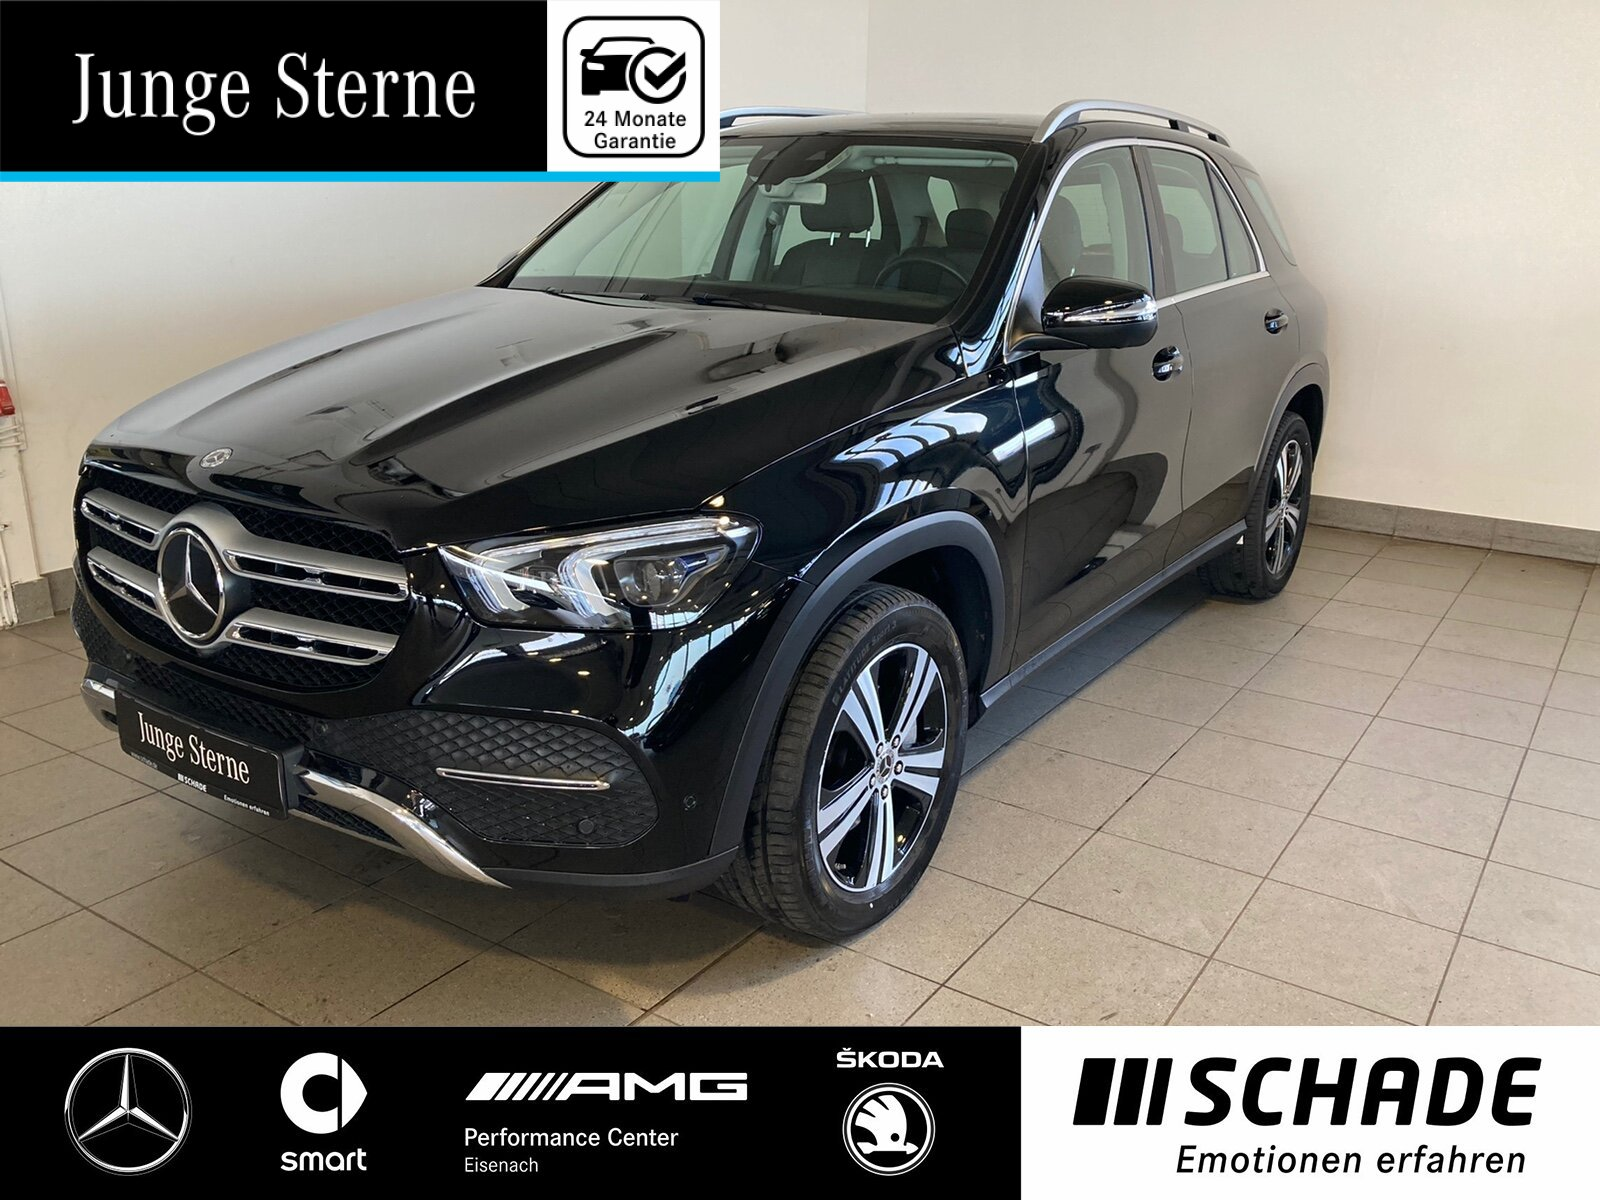 Mercedes-Benz GLE 300 d 4M Distronic*AHK*360°Kamera*LED Multi., Jahr 2019, Diesel